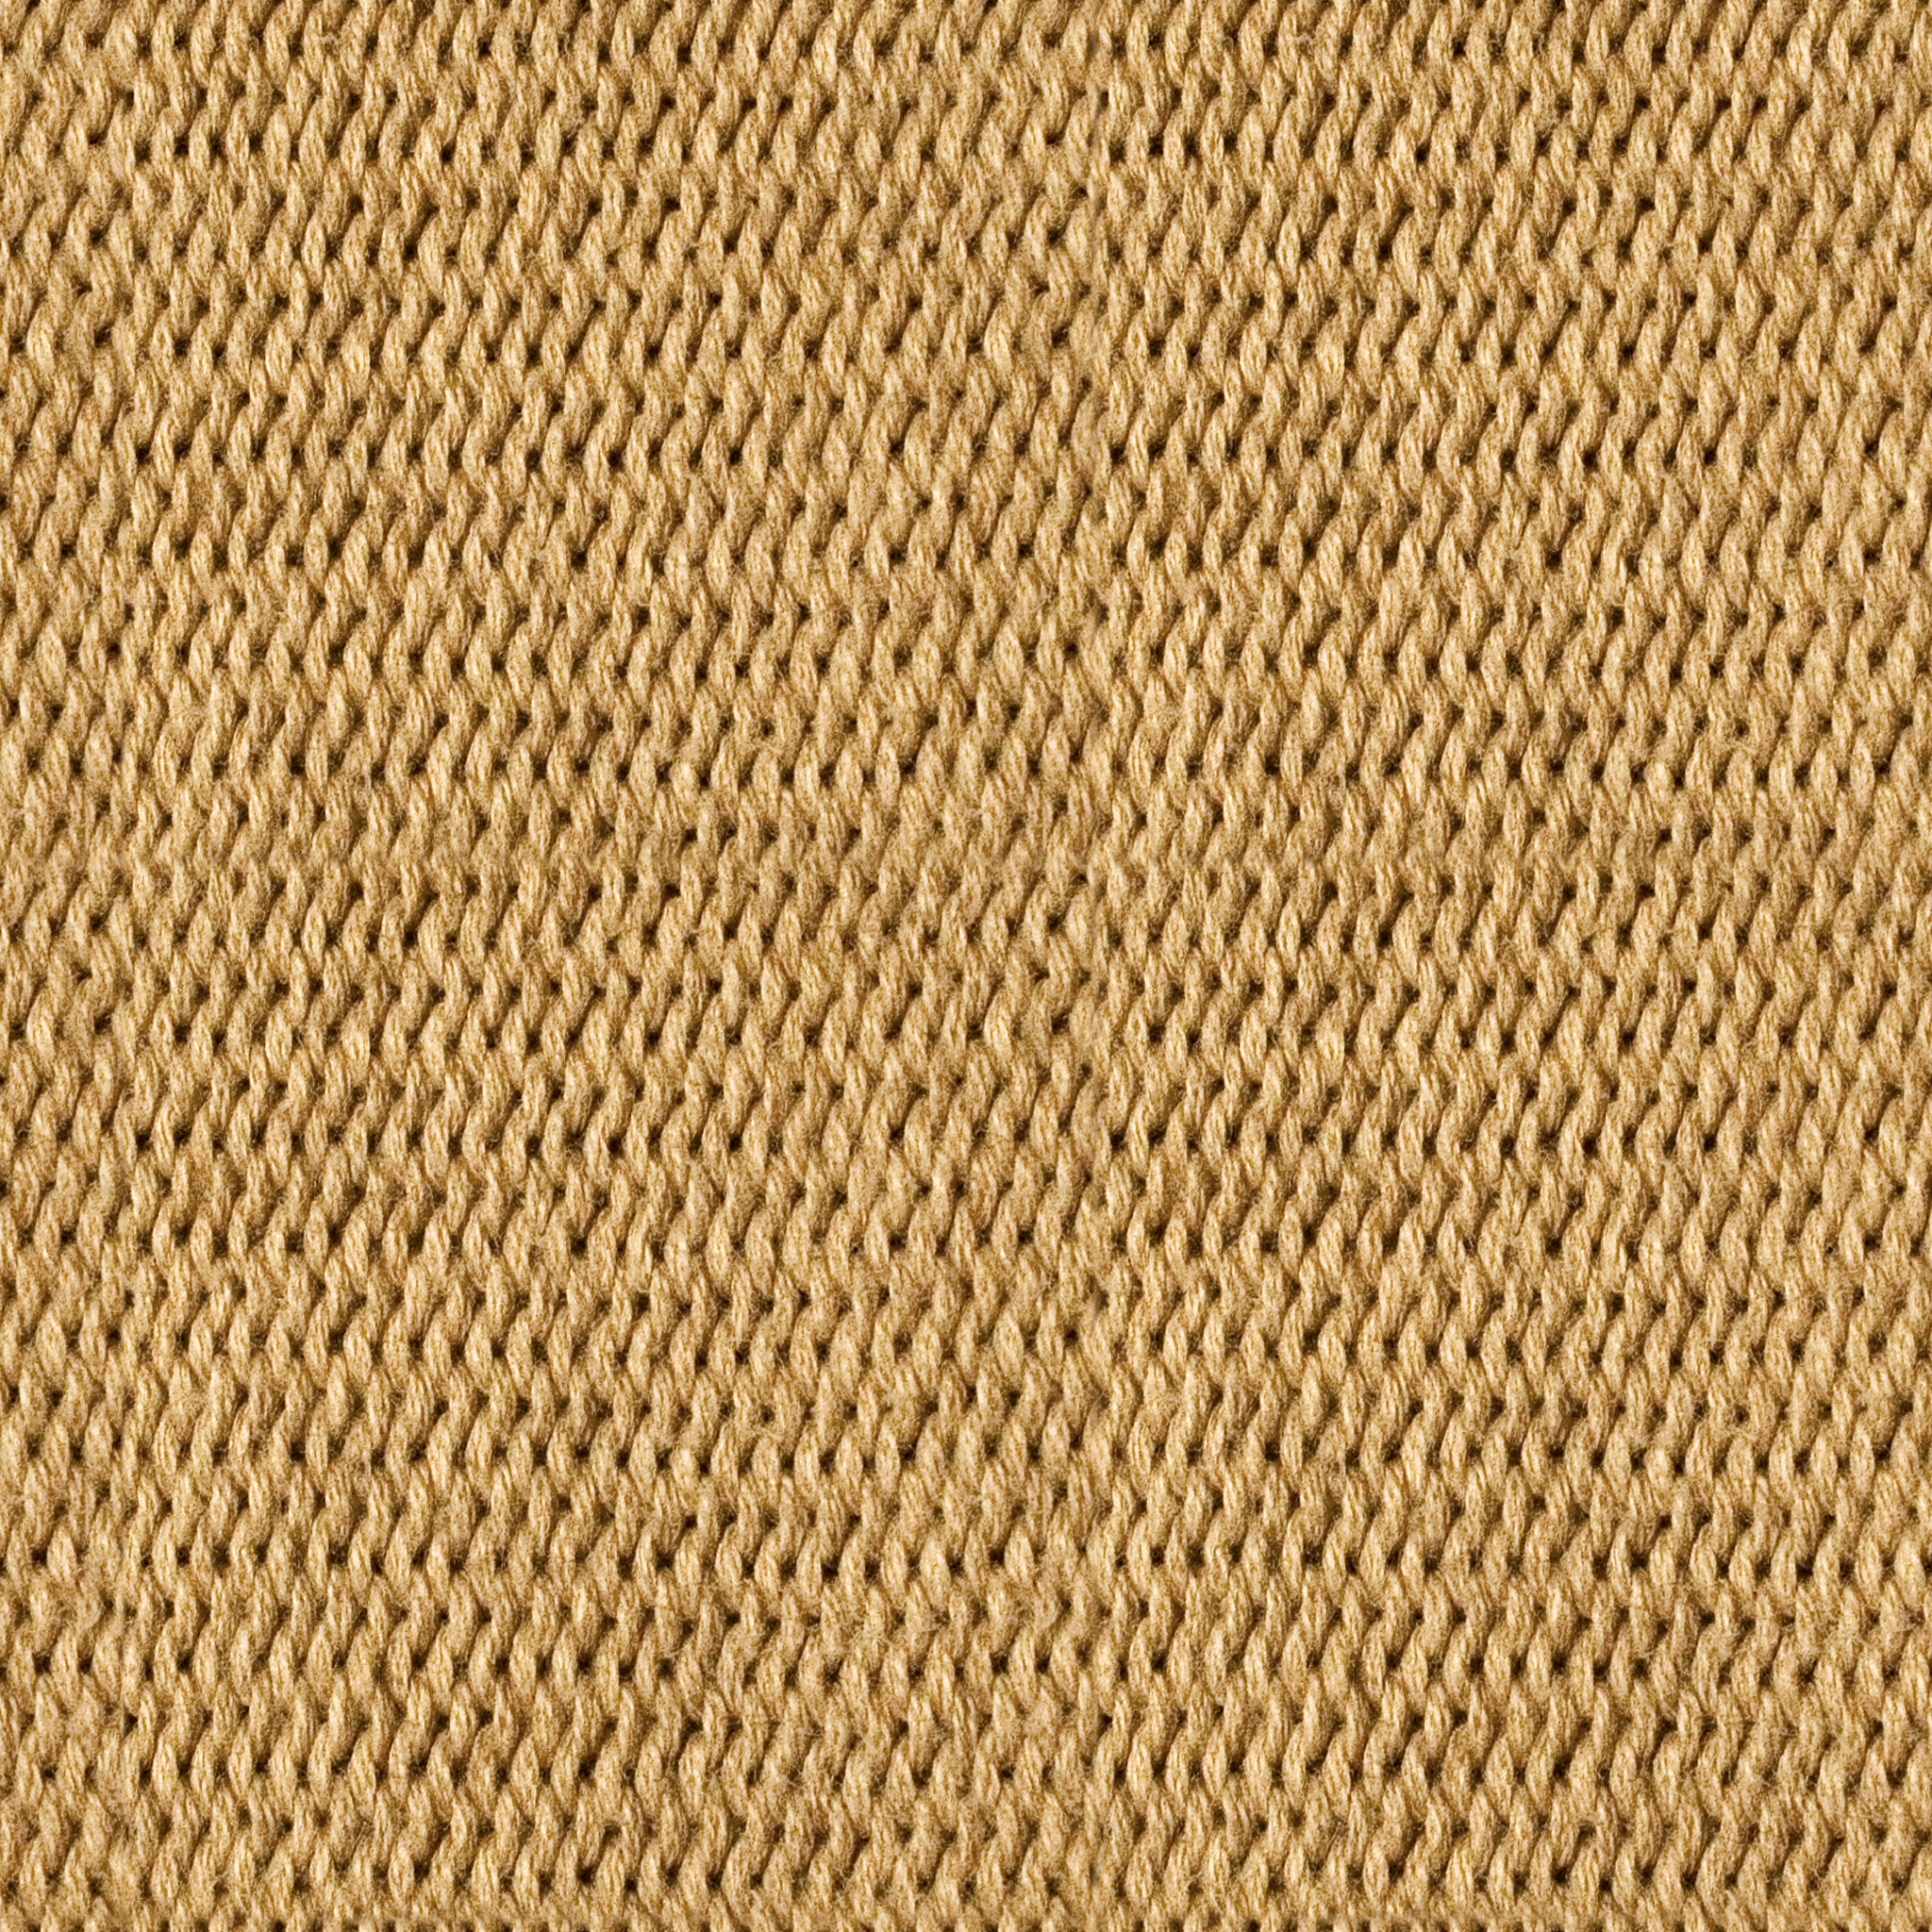 Burlap Knit.jpg